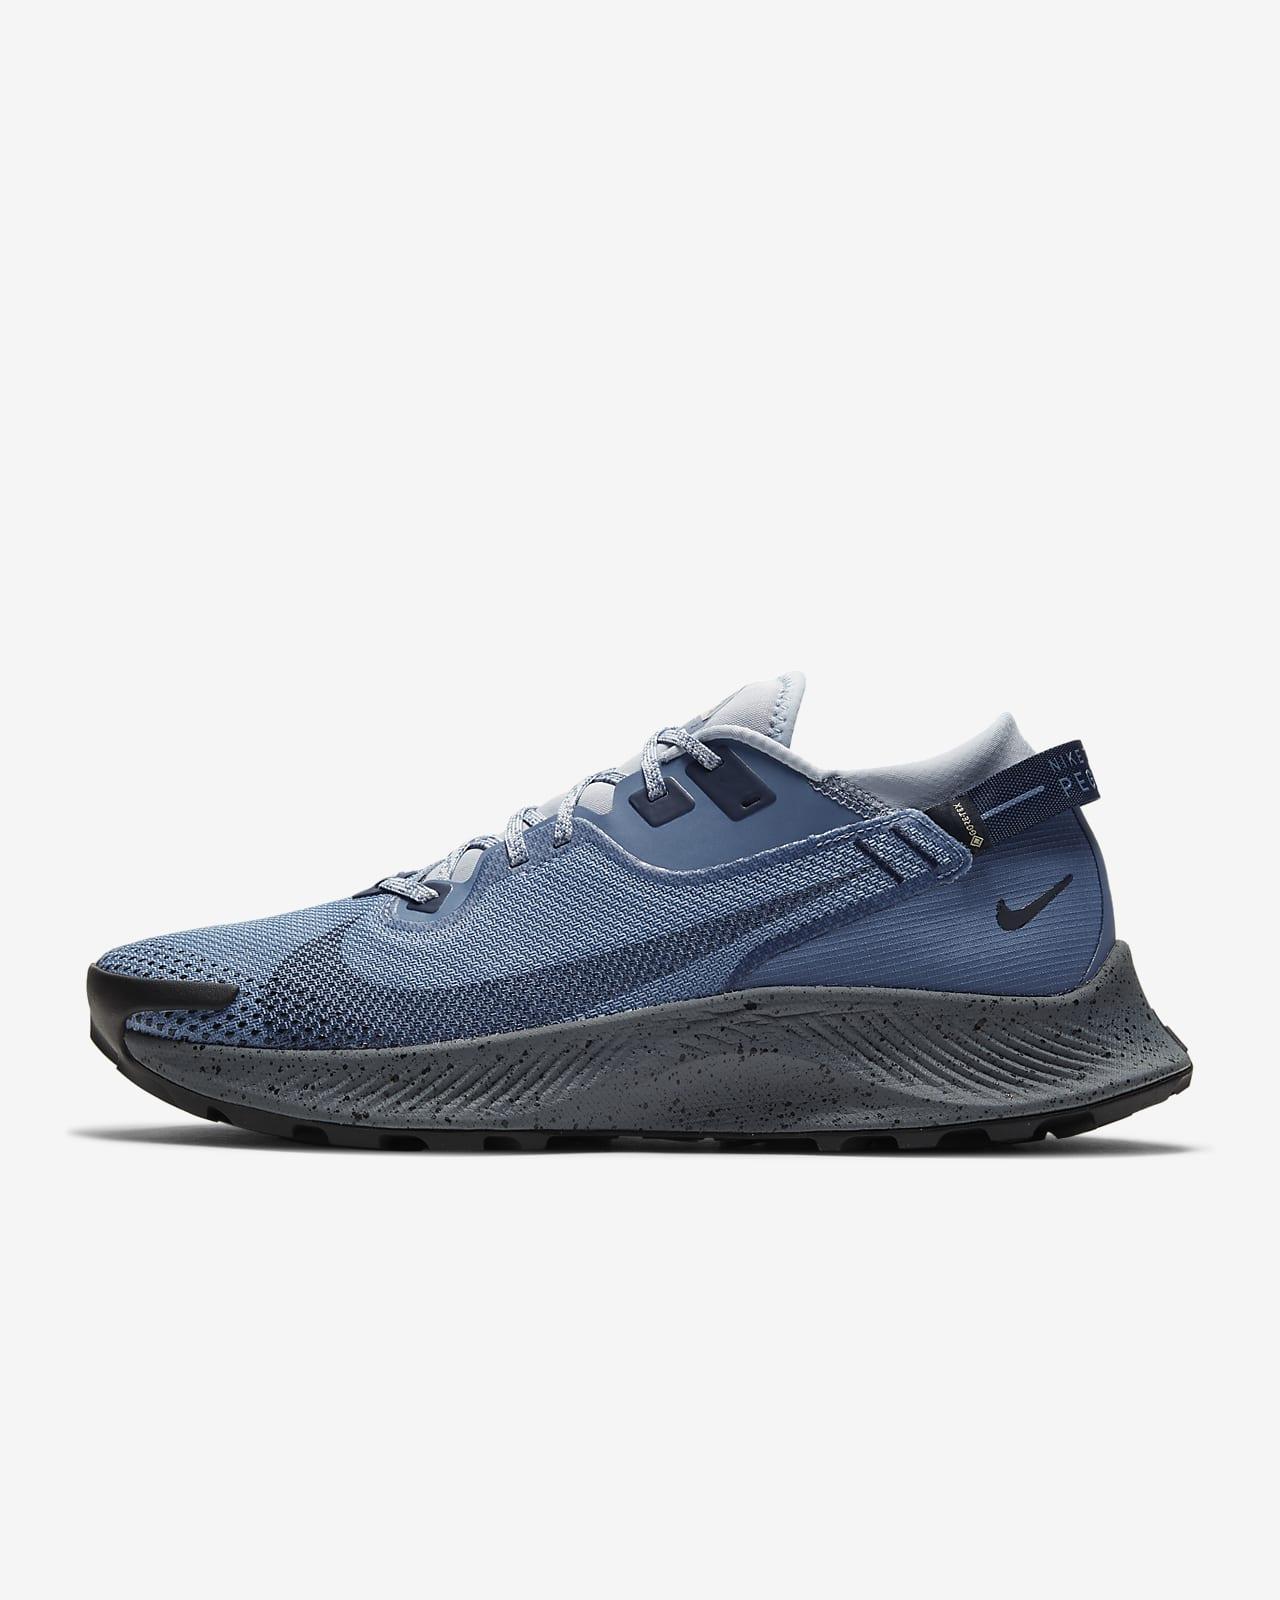 Мужские кроссовки для трейлраннинга Nike Pegasus Trail 2 GORE-TEX